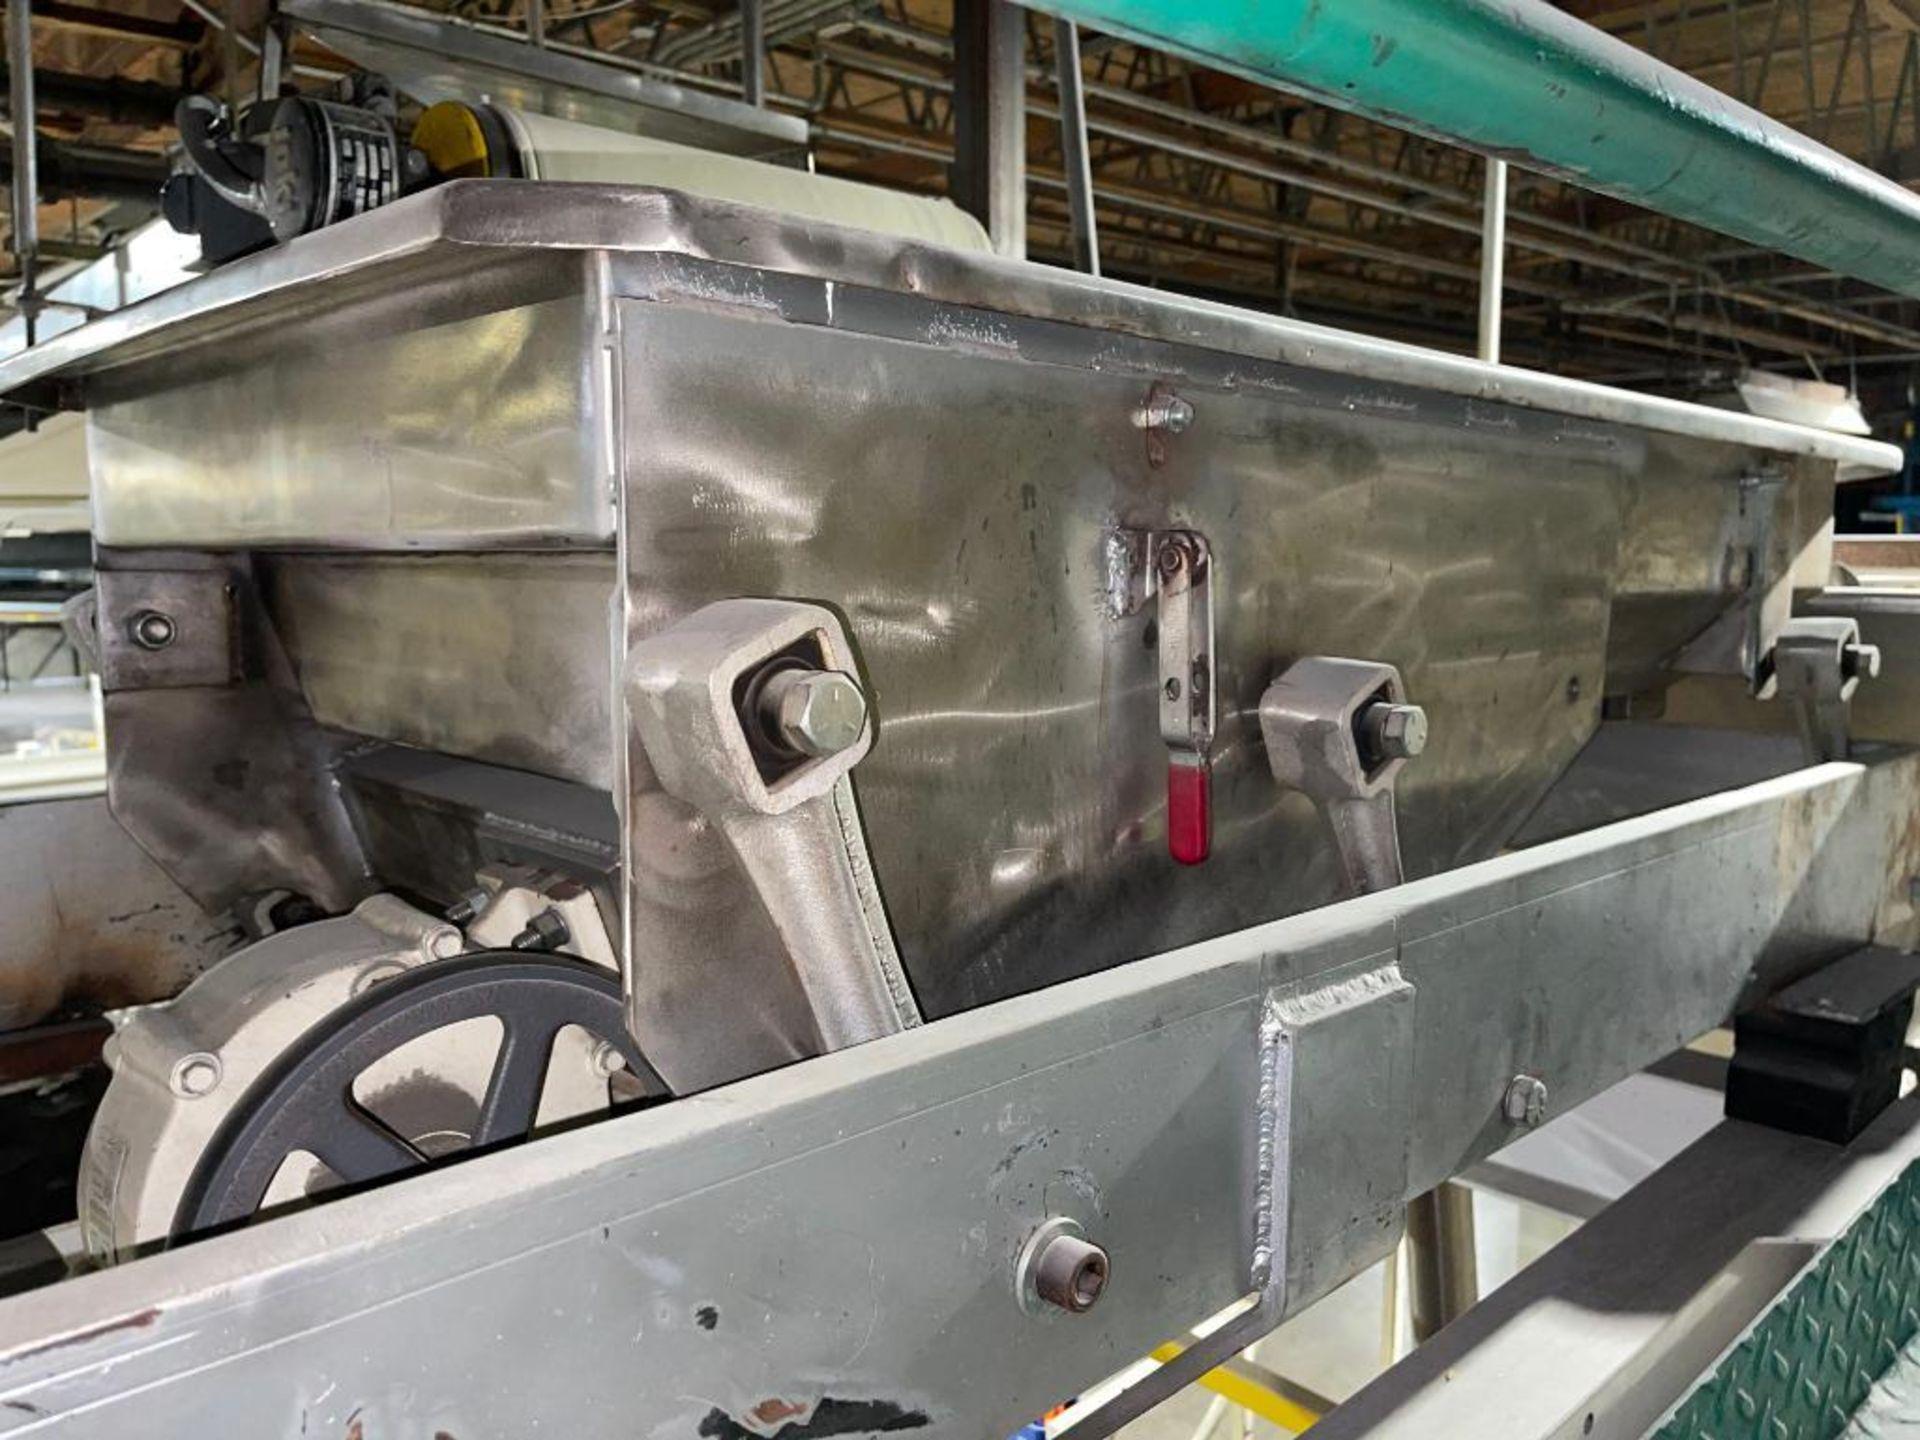 Eriez vibratory conveyor - Image 5 of 7